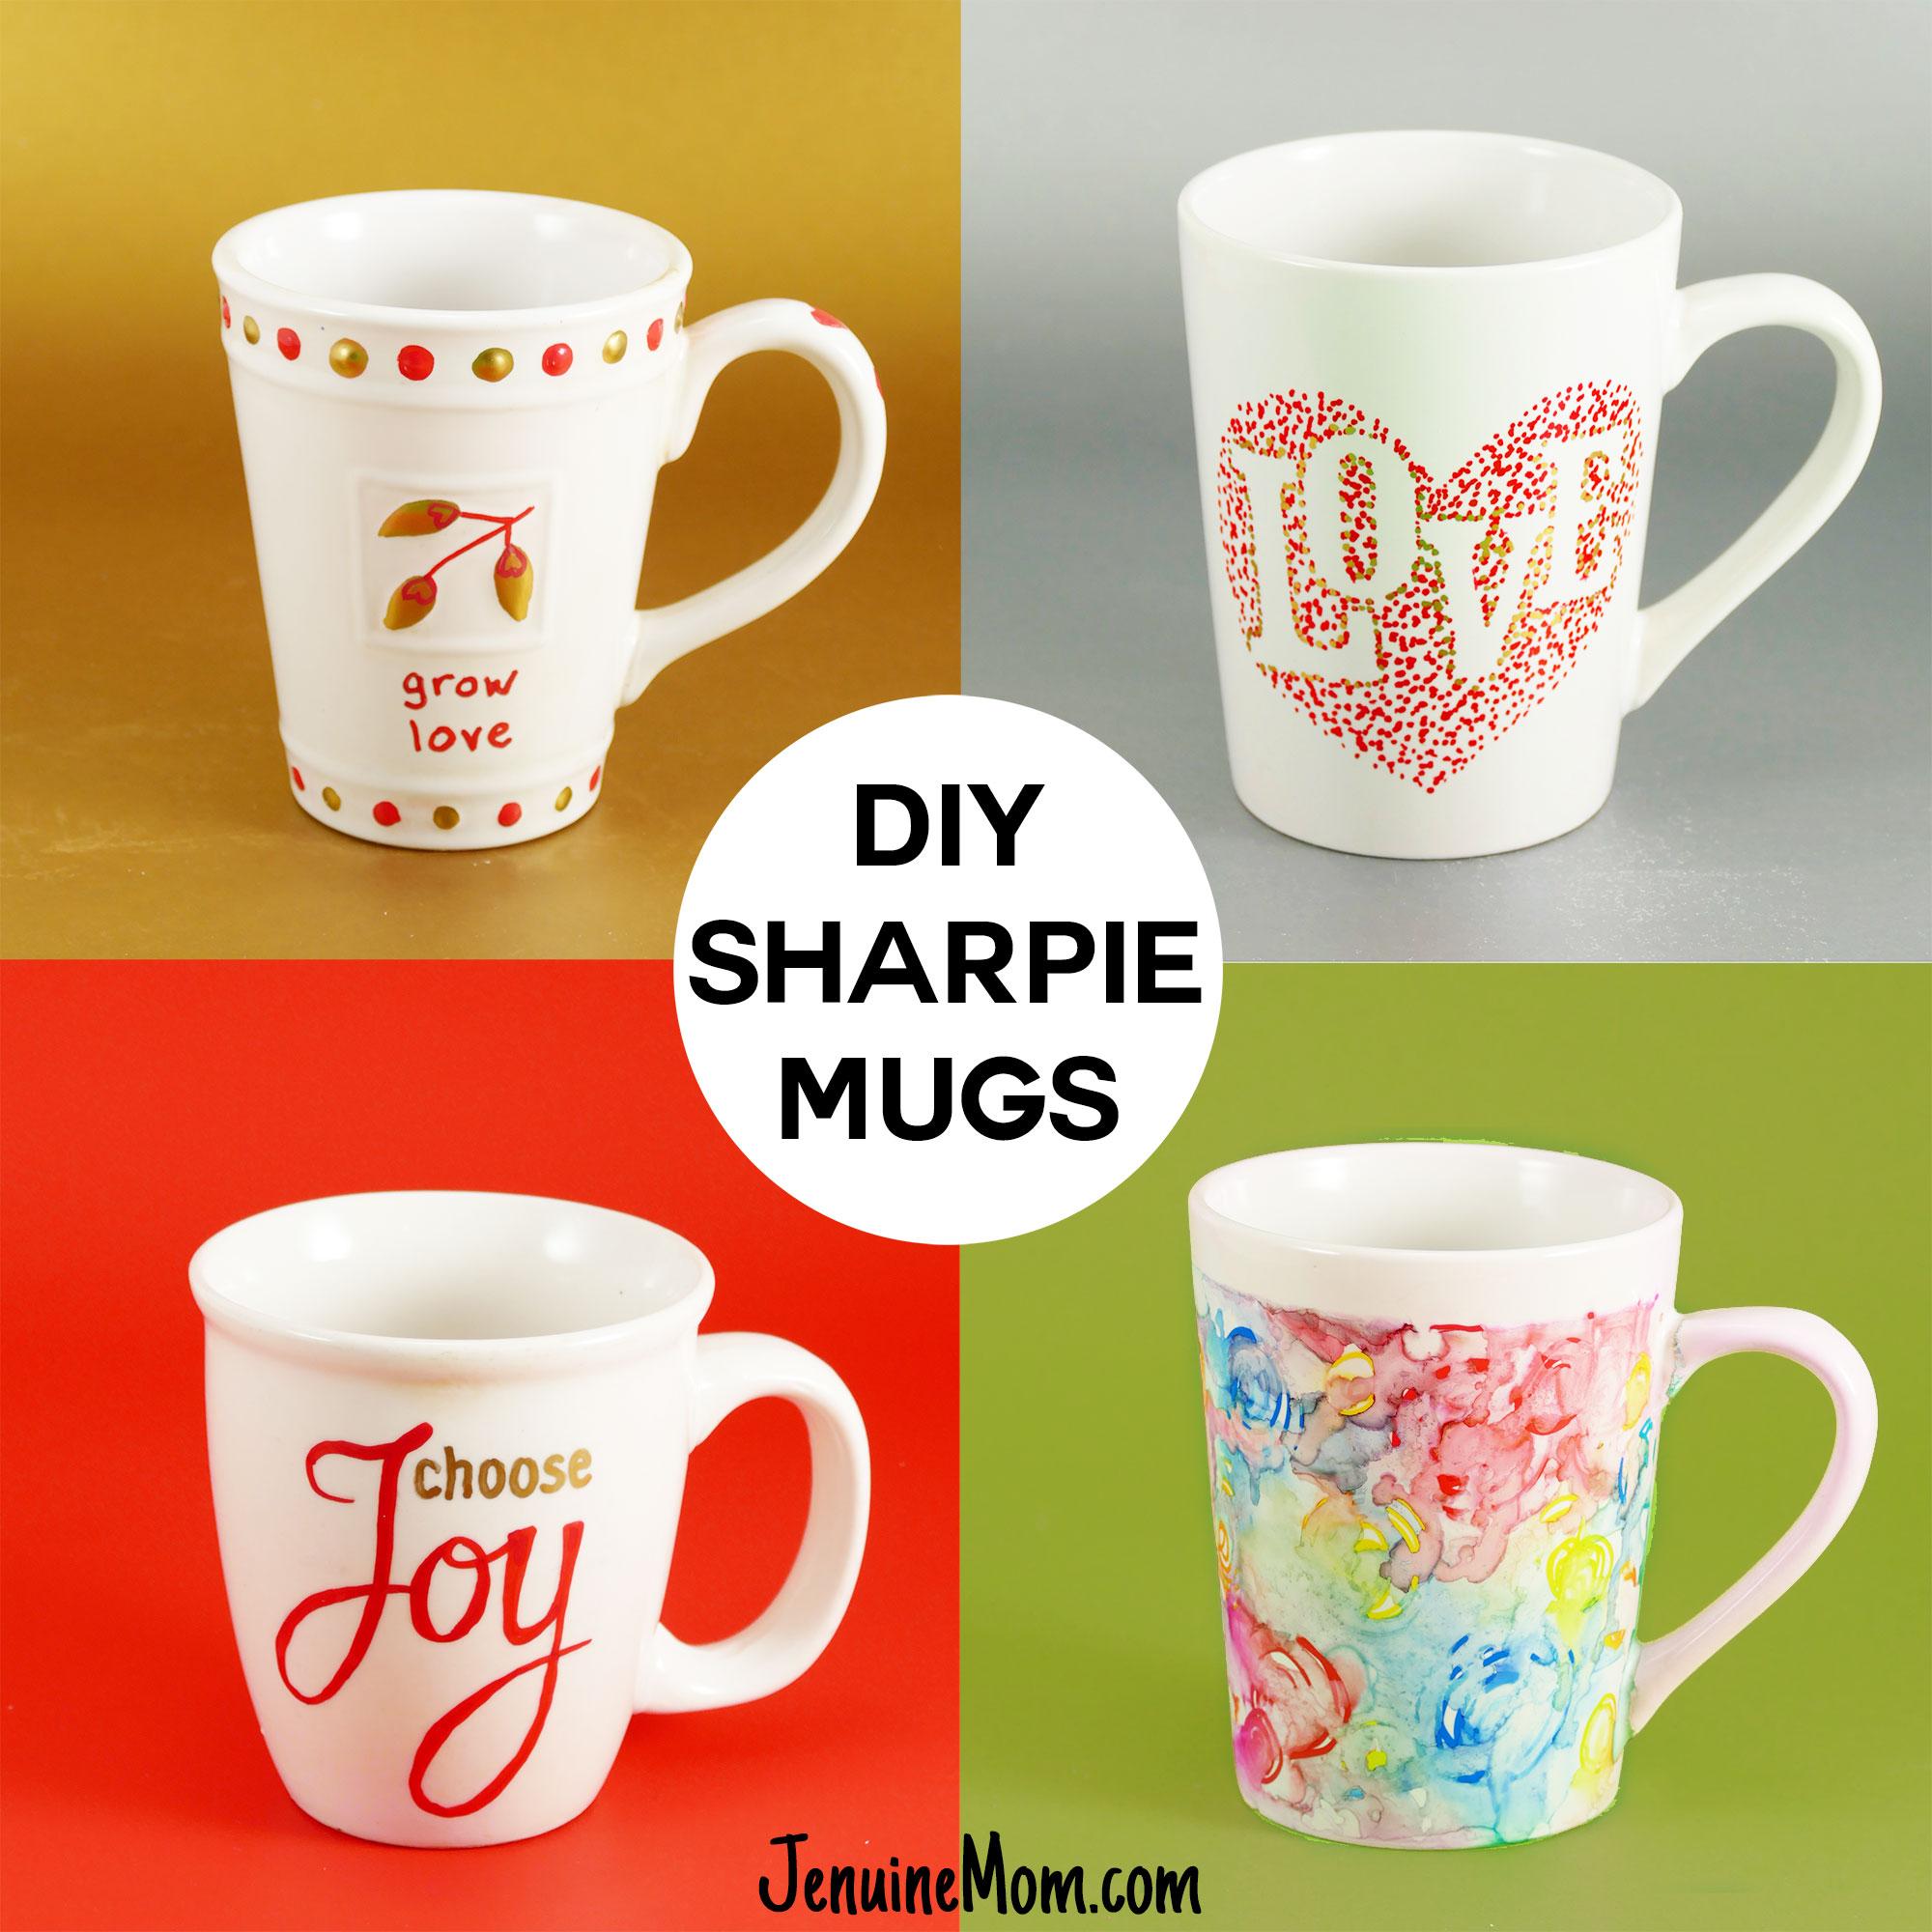 diy sharpie mugs for